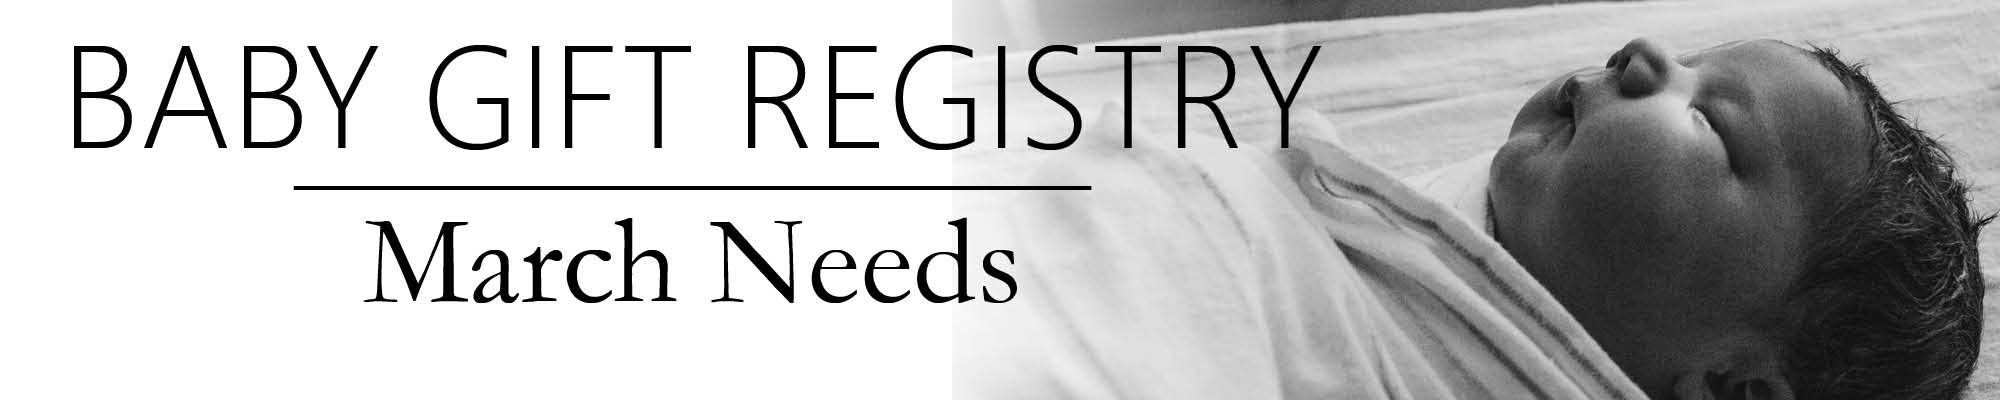 Baby Gift Registry - Blog Banner - March.jpg